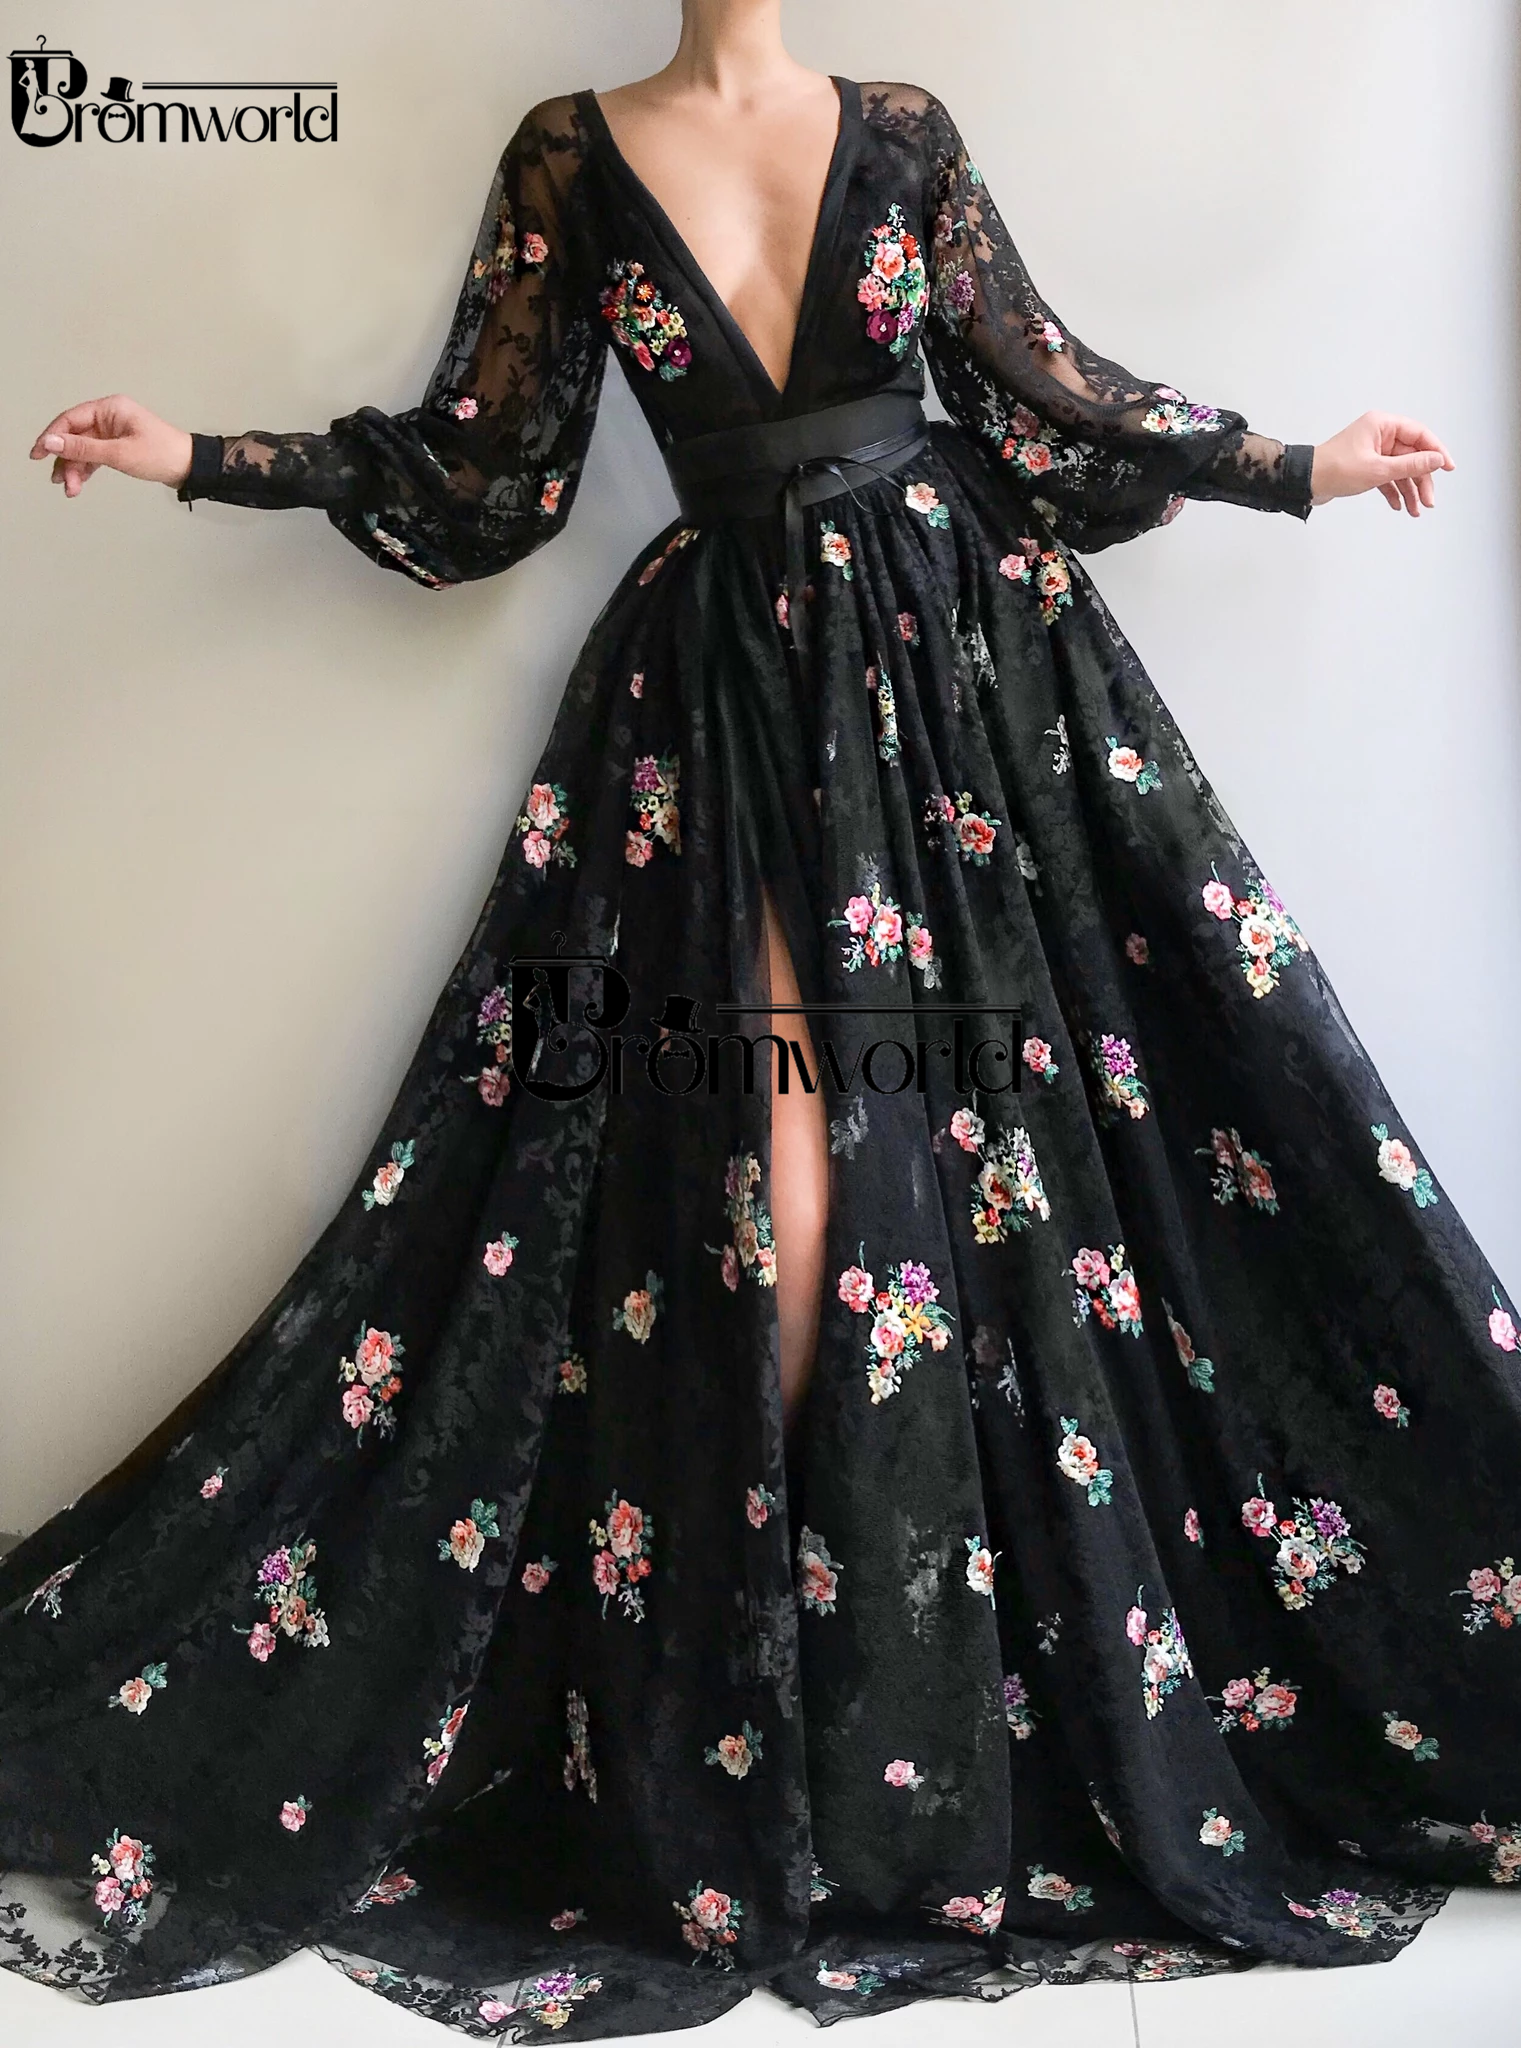 Zwart Sexy Kant Avondjurk 2020 V-hals Borduren Bloemen Formele Jurk Hoge Split Elegante Lange Mouwen Evening Prom Jassen